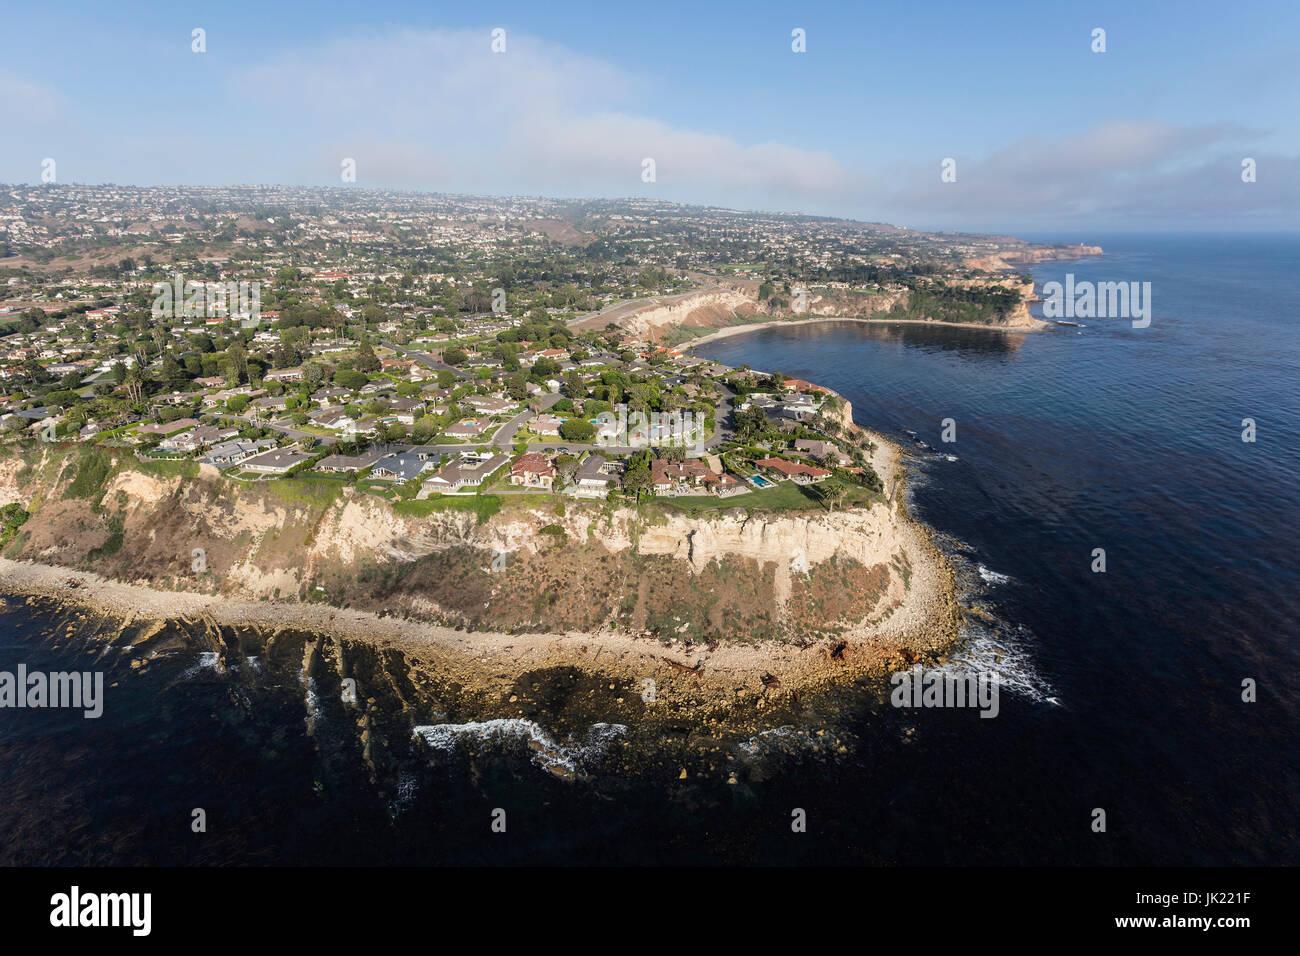 Aerial view of the Rancho Palos Verdes shoreline in Los Angeles County, California. Stock Photo